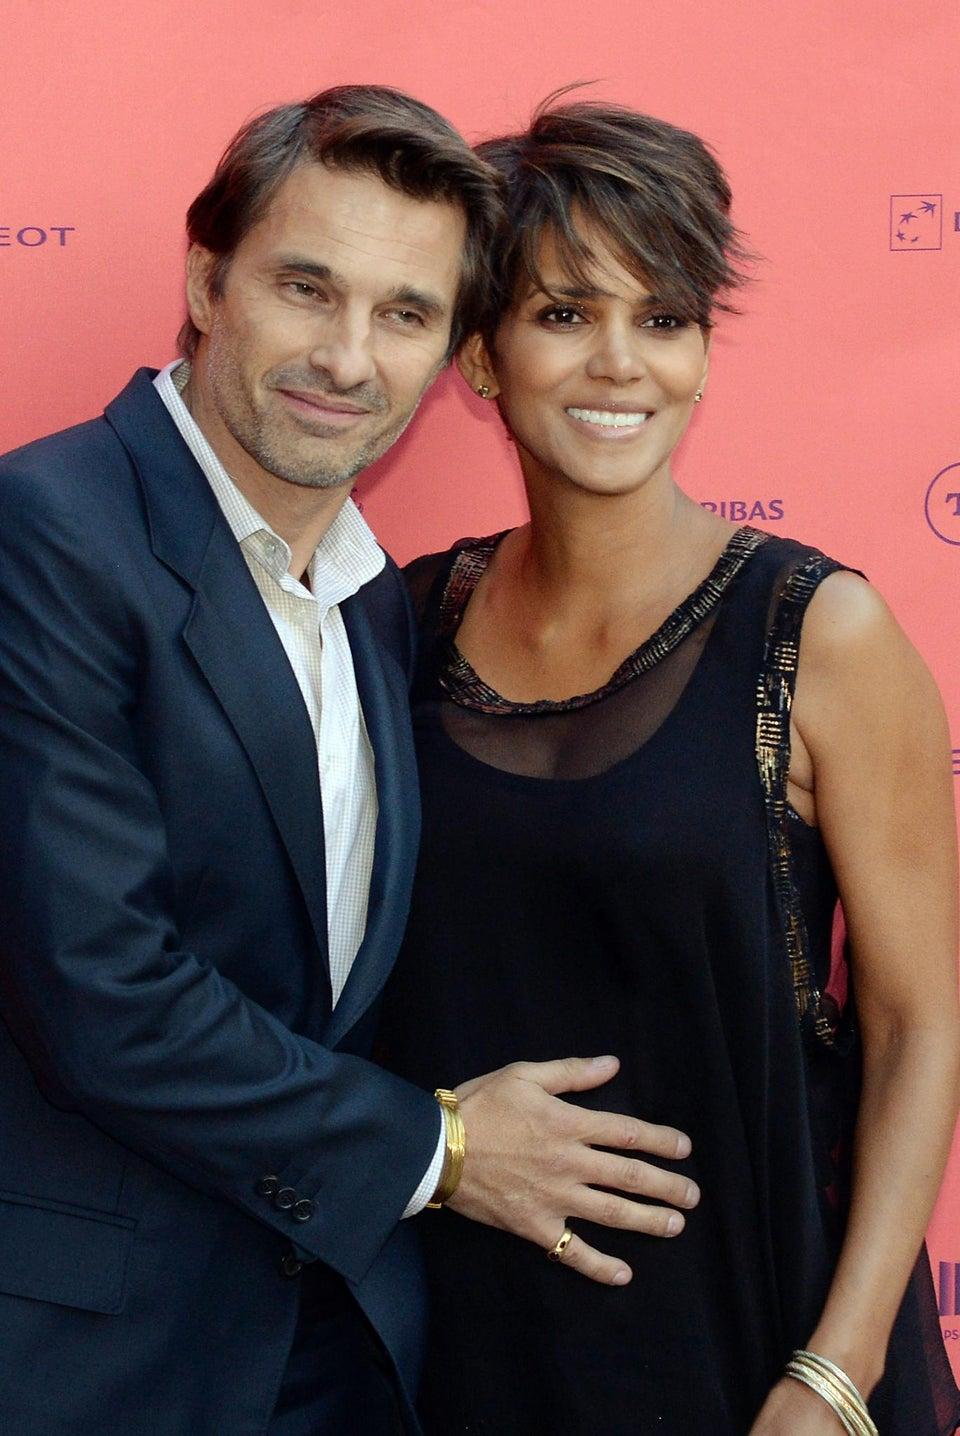 Coffee Talk: Halle Berry & Olivier Martinez's Baby Name Revealed